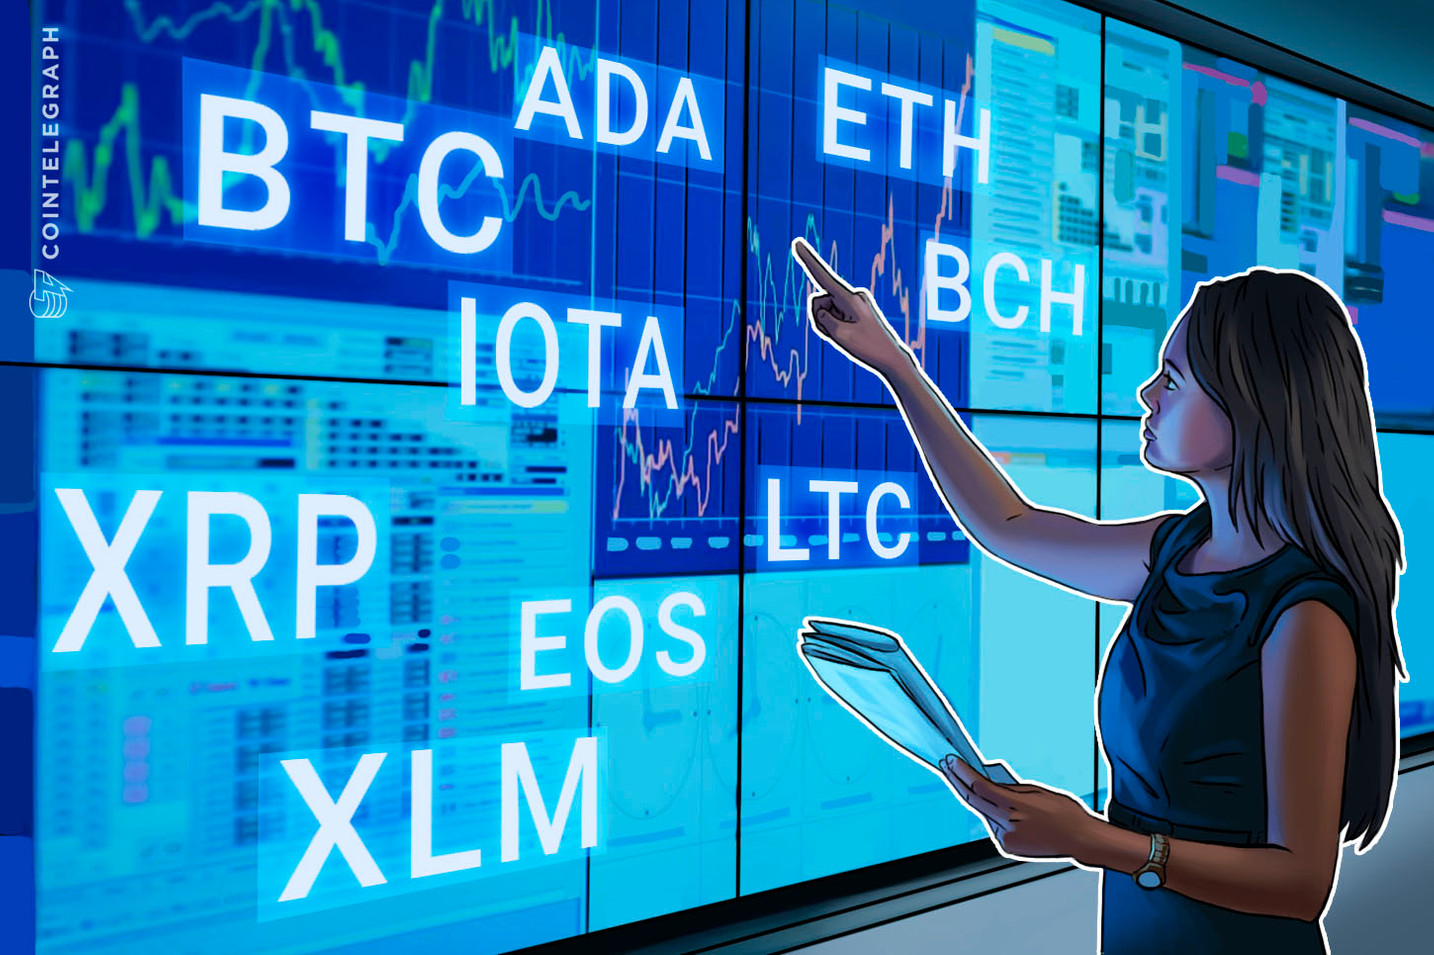 Bitcoin, Ethereum, Ripple, Bitcoin Cash, EOS, Litecoin, Cardano, Stellar, IOTA: Analisi dei prezzi, 15 giugno